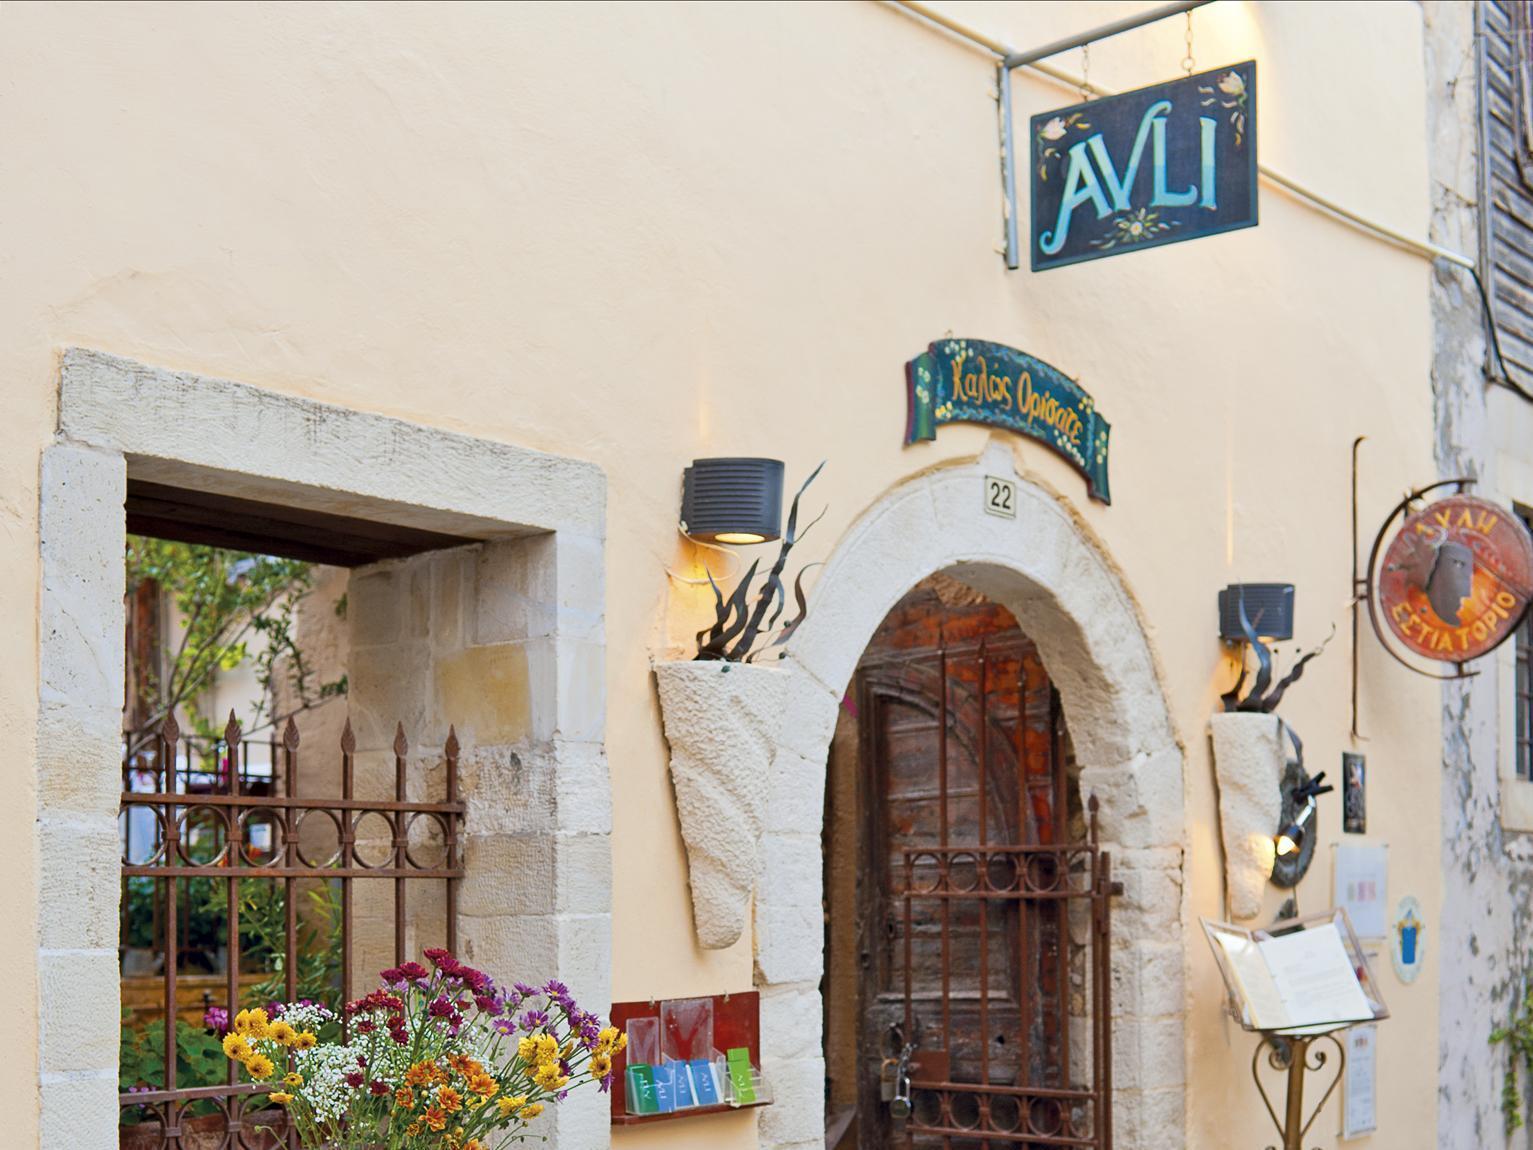 Avli Lounge Apartments - Crete Island